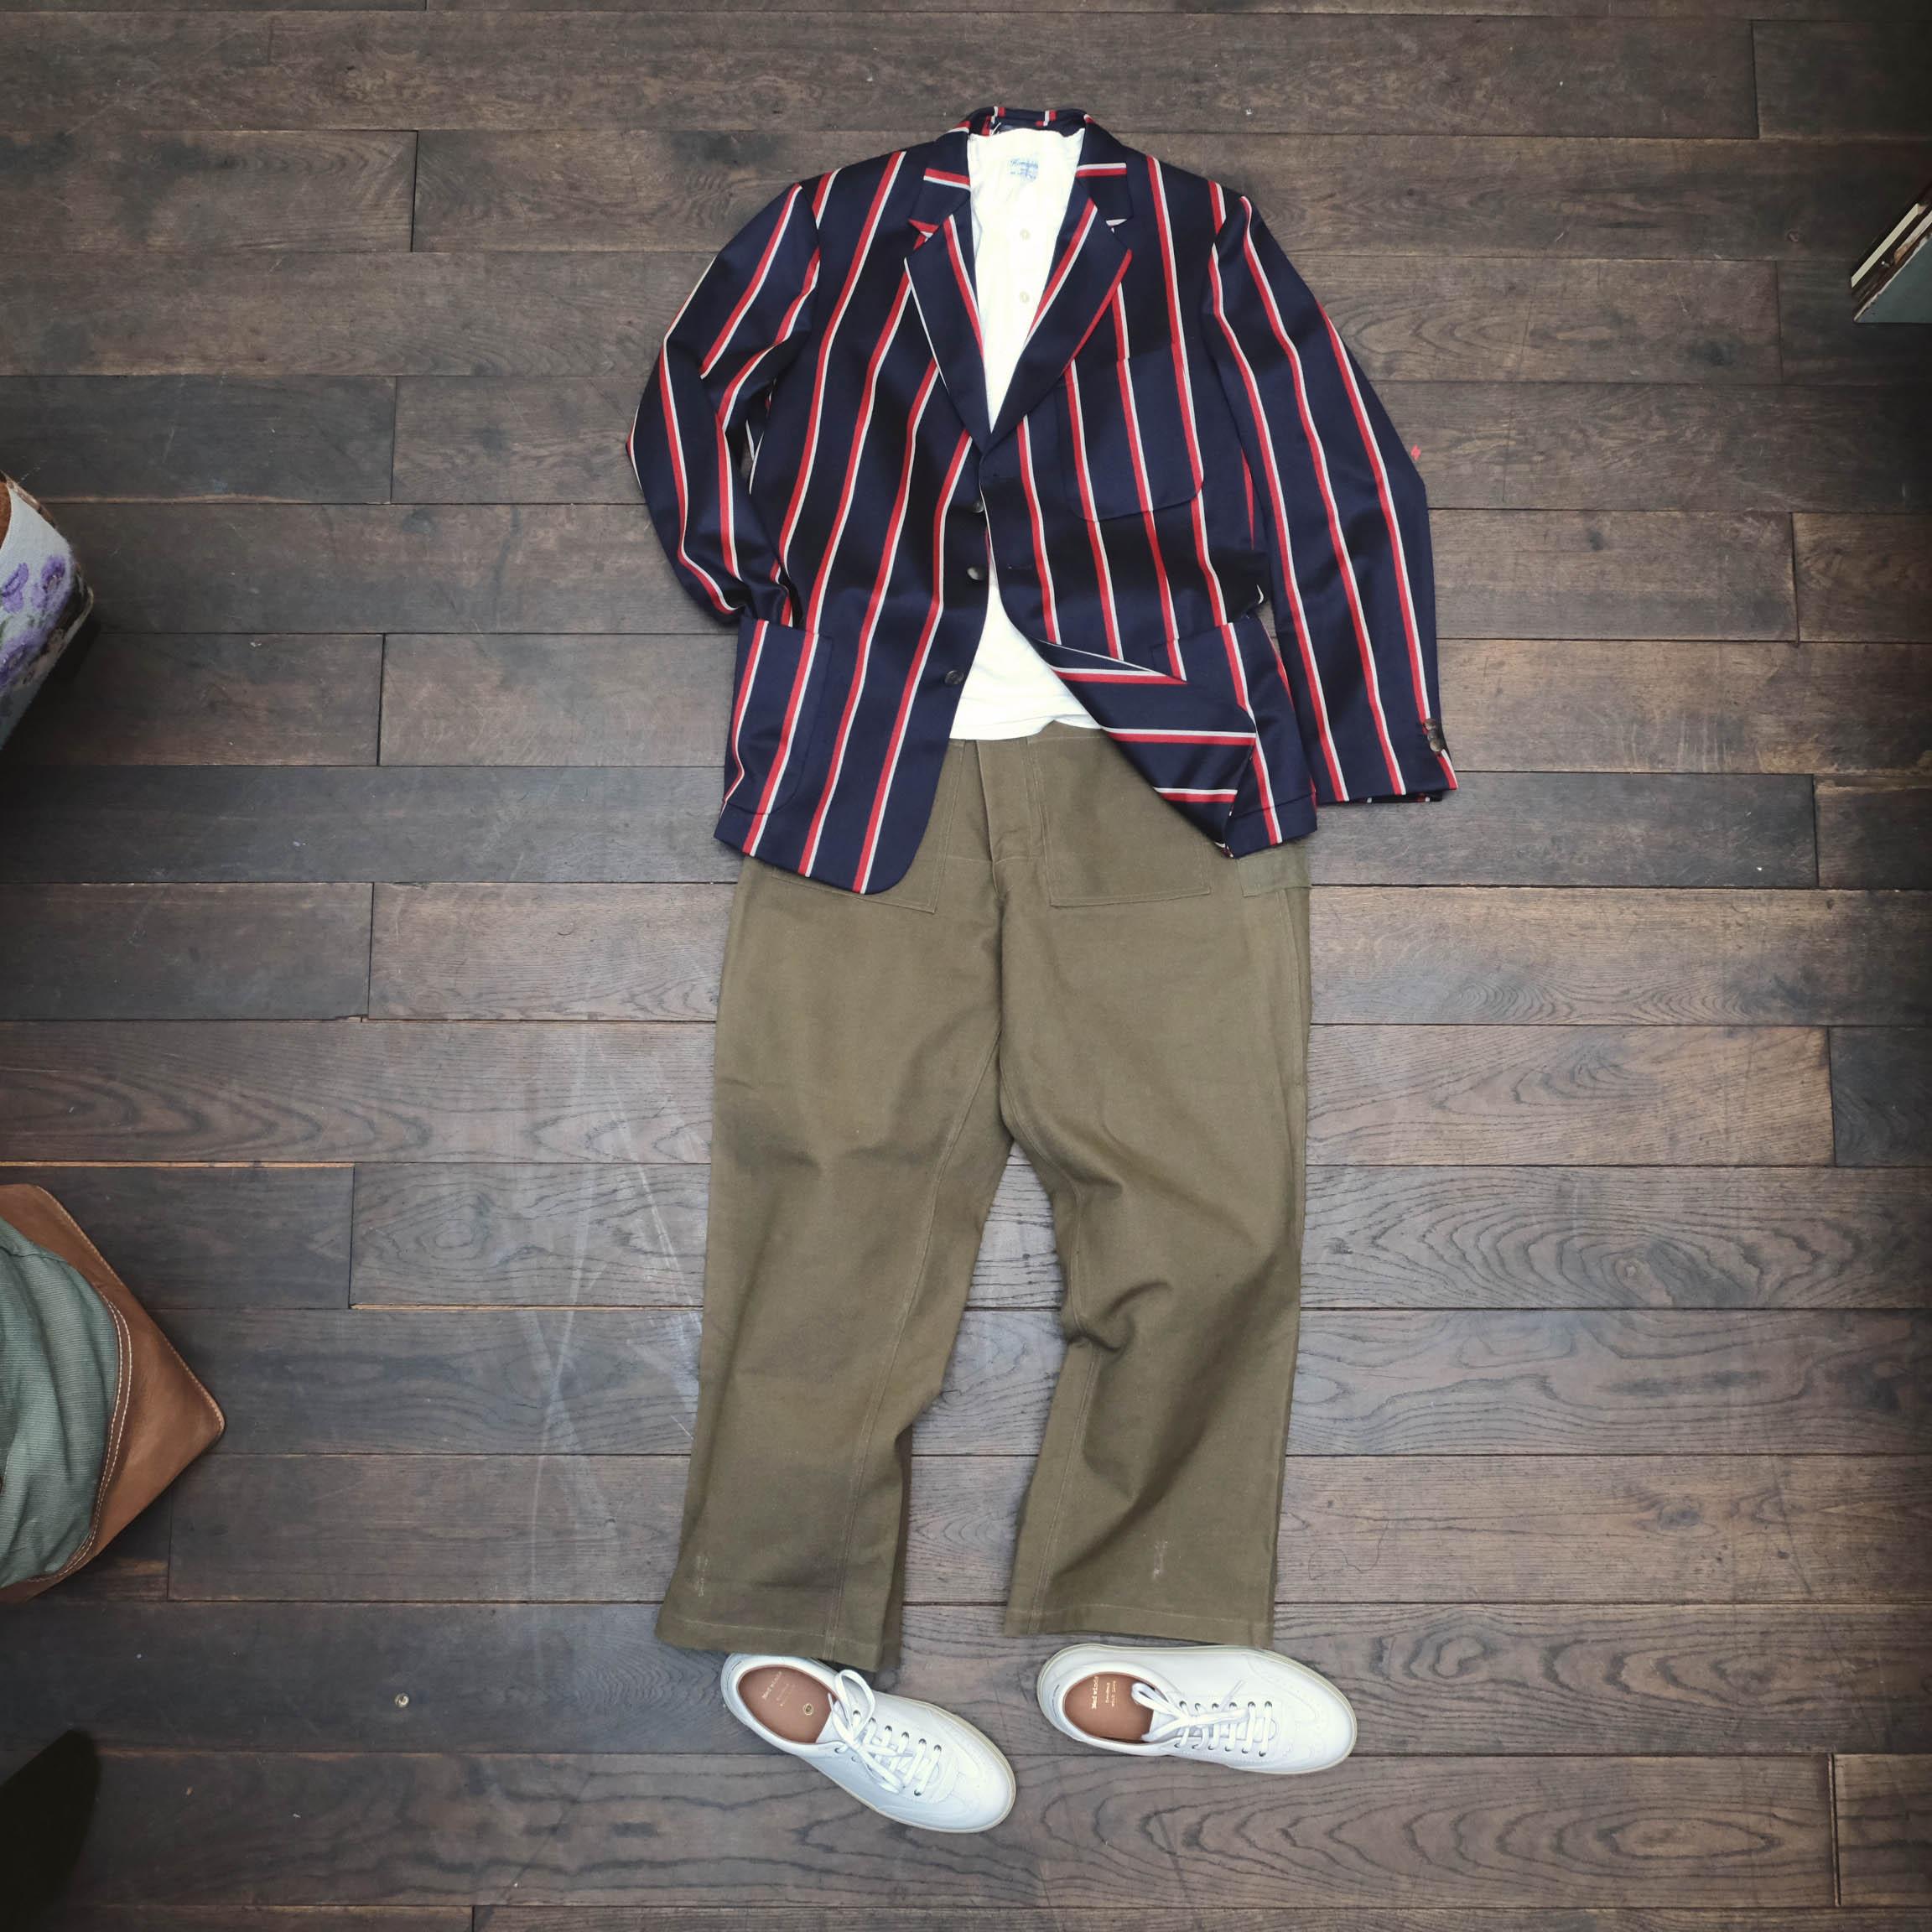 tommypage-clubblazer-vintage-hose-militär-medwinds-sneaker-homespun-shirt